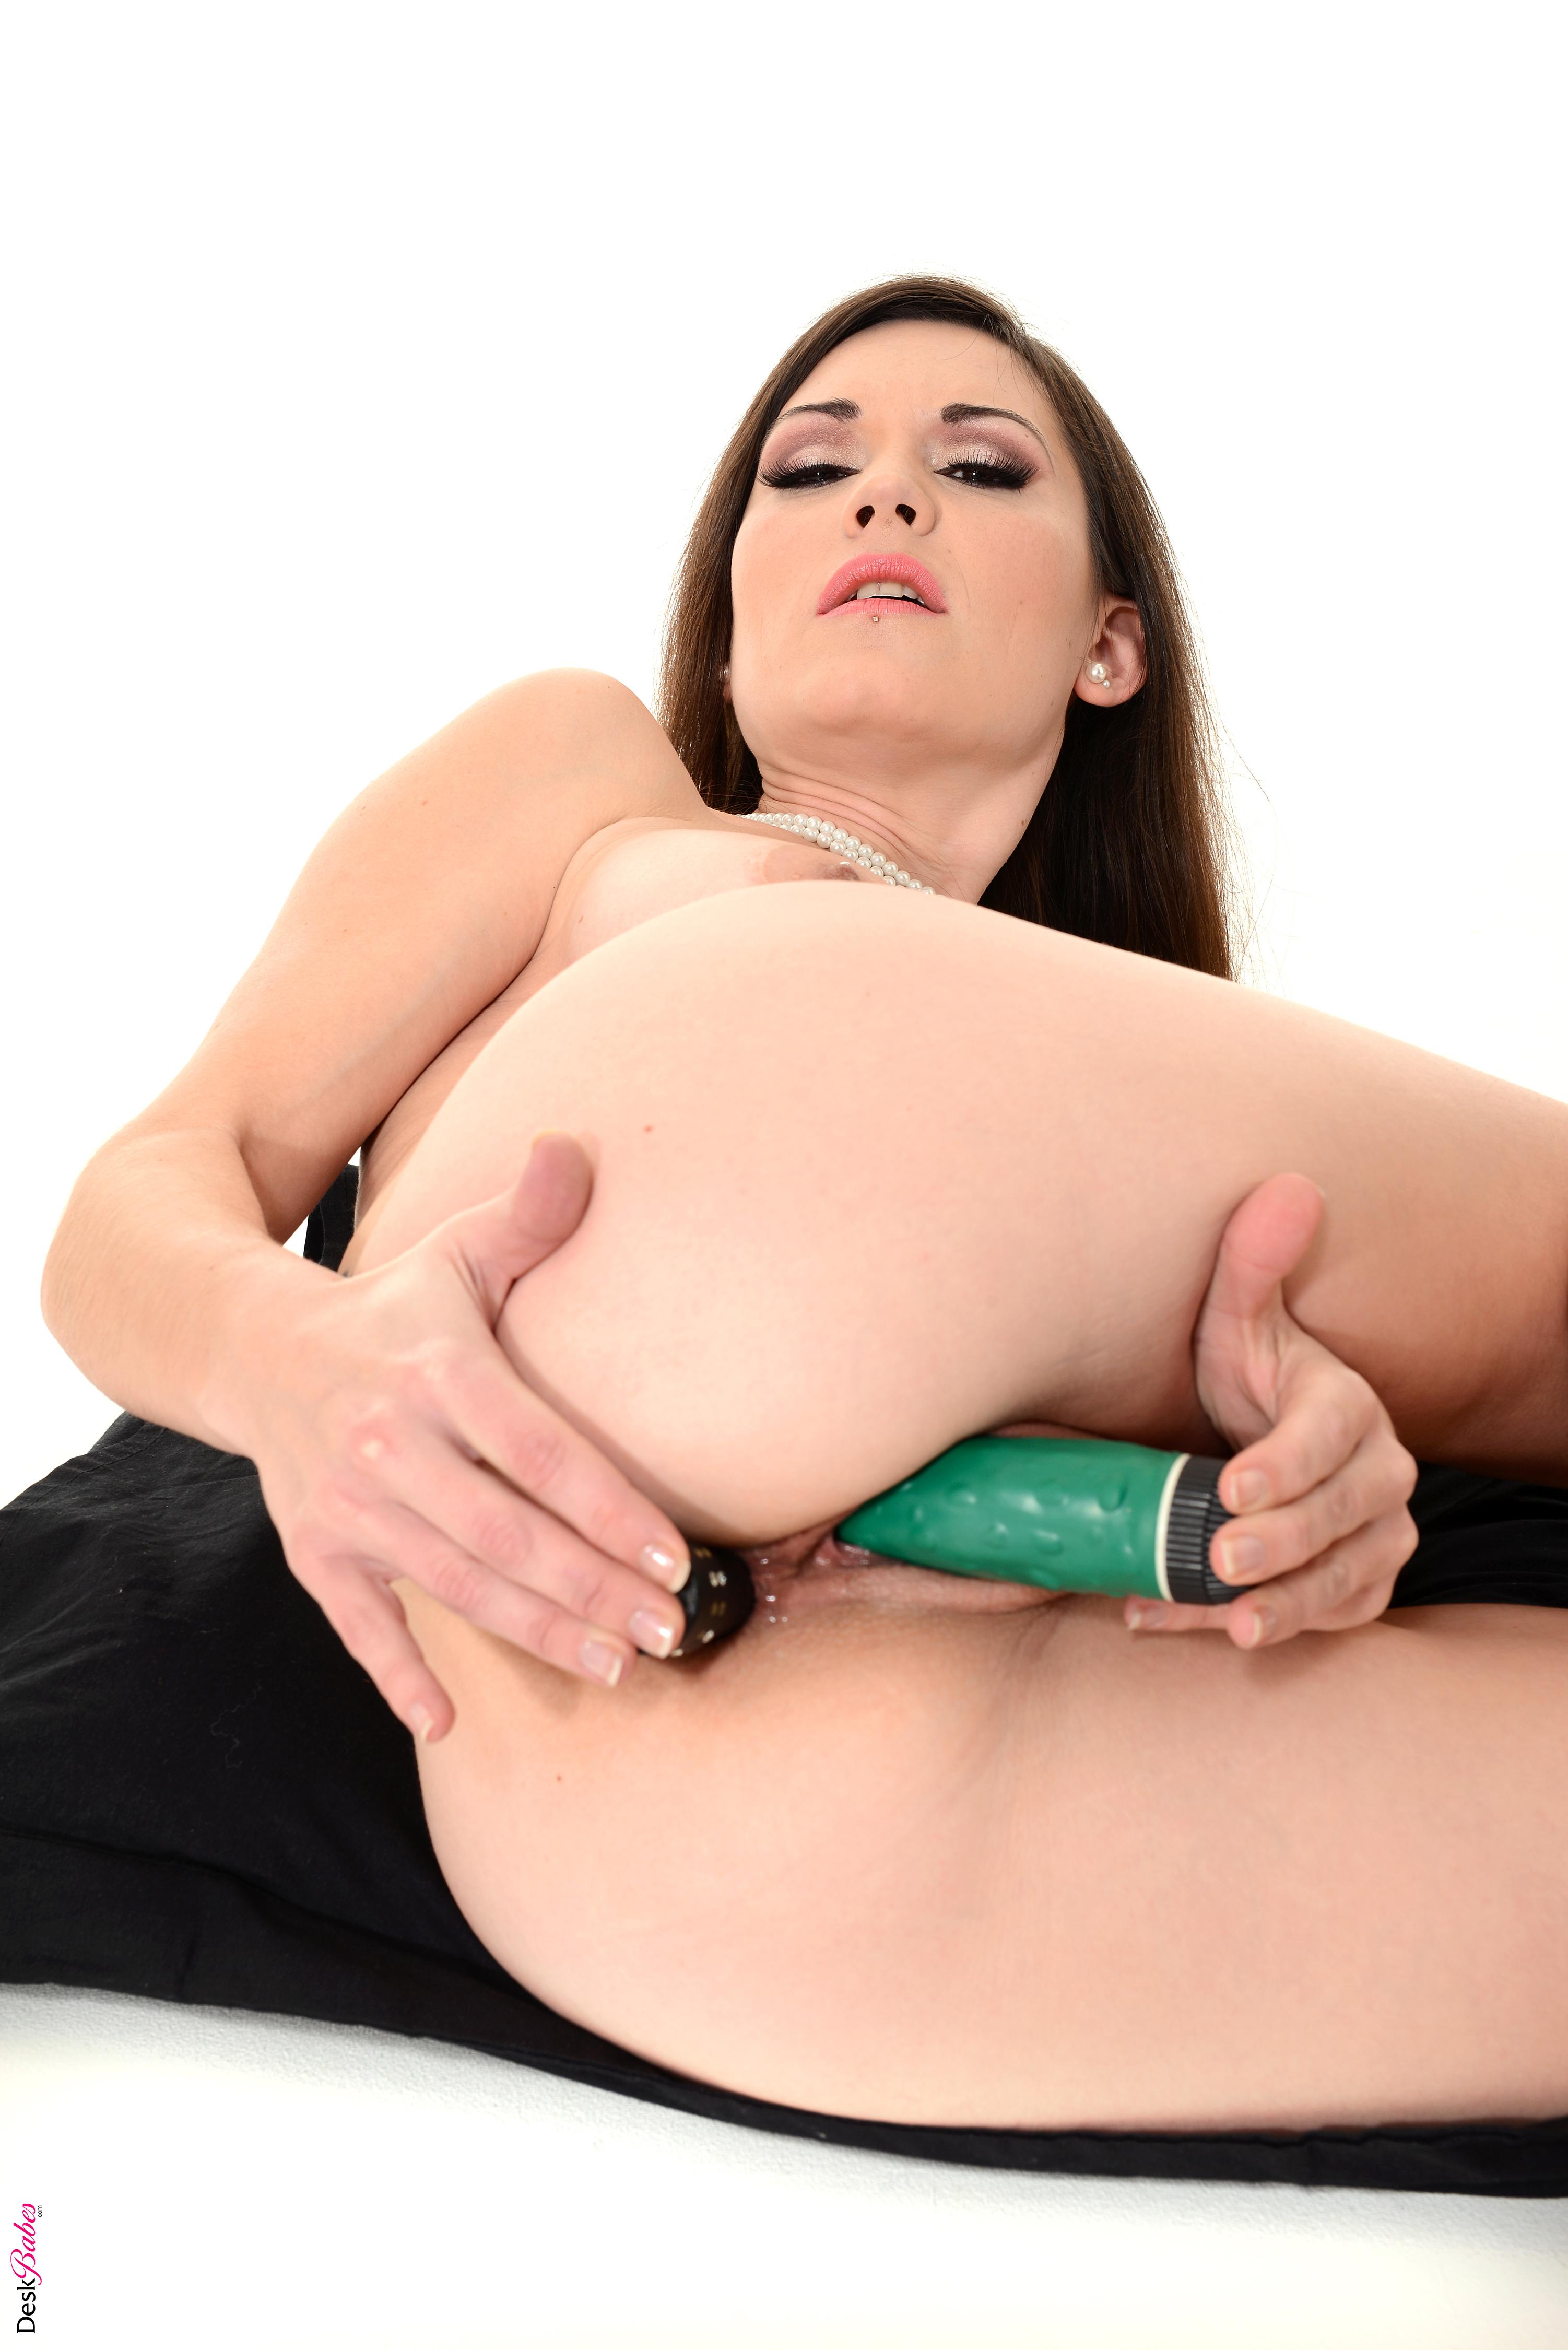 sexy boob wallpaper